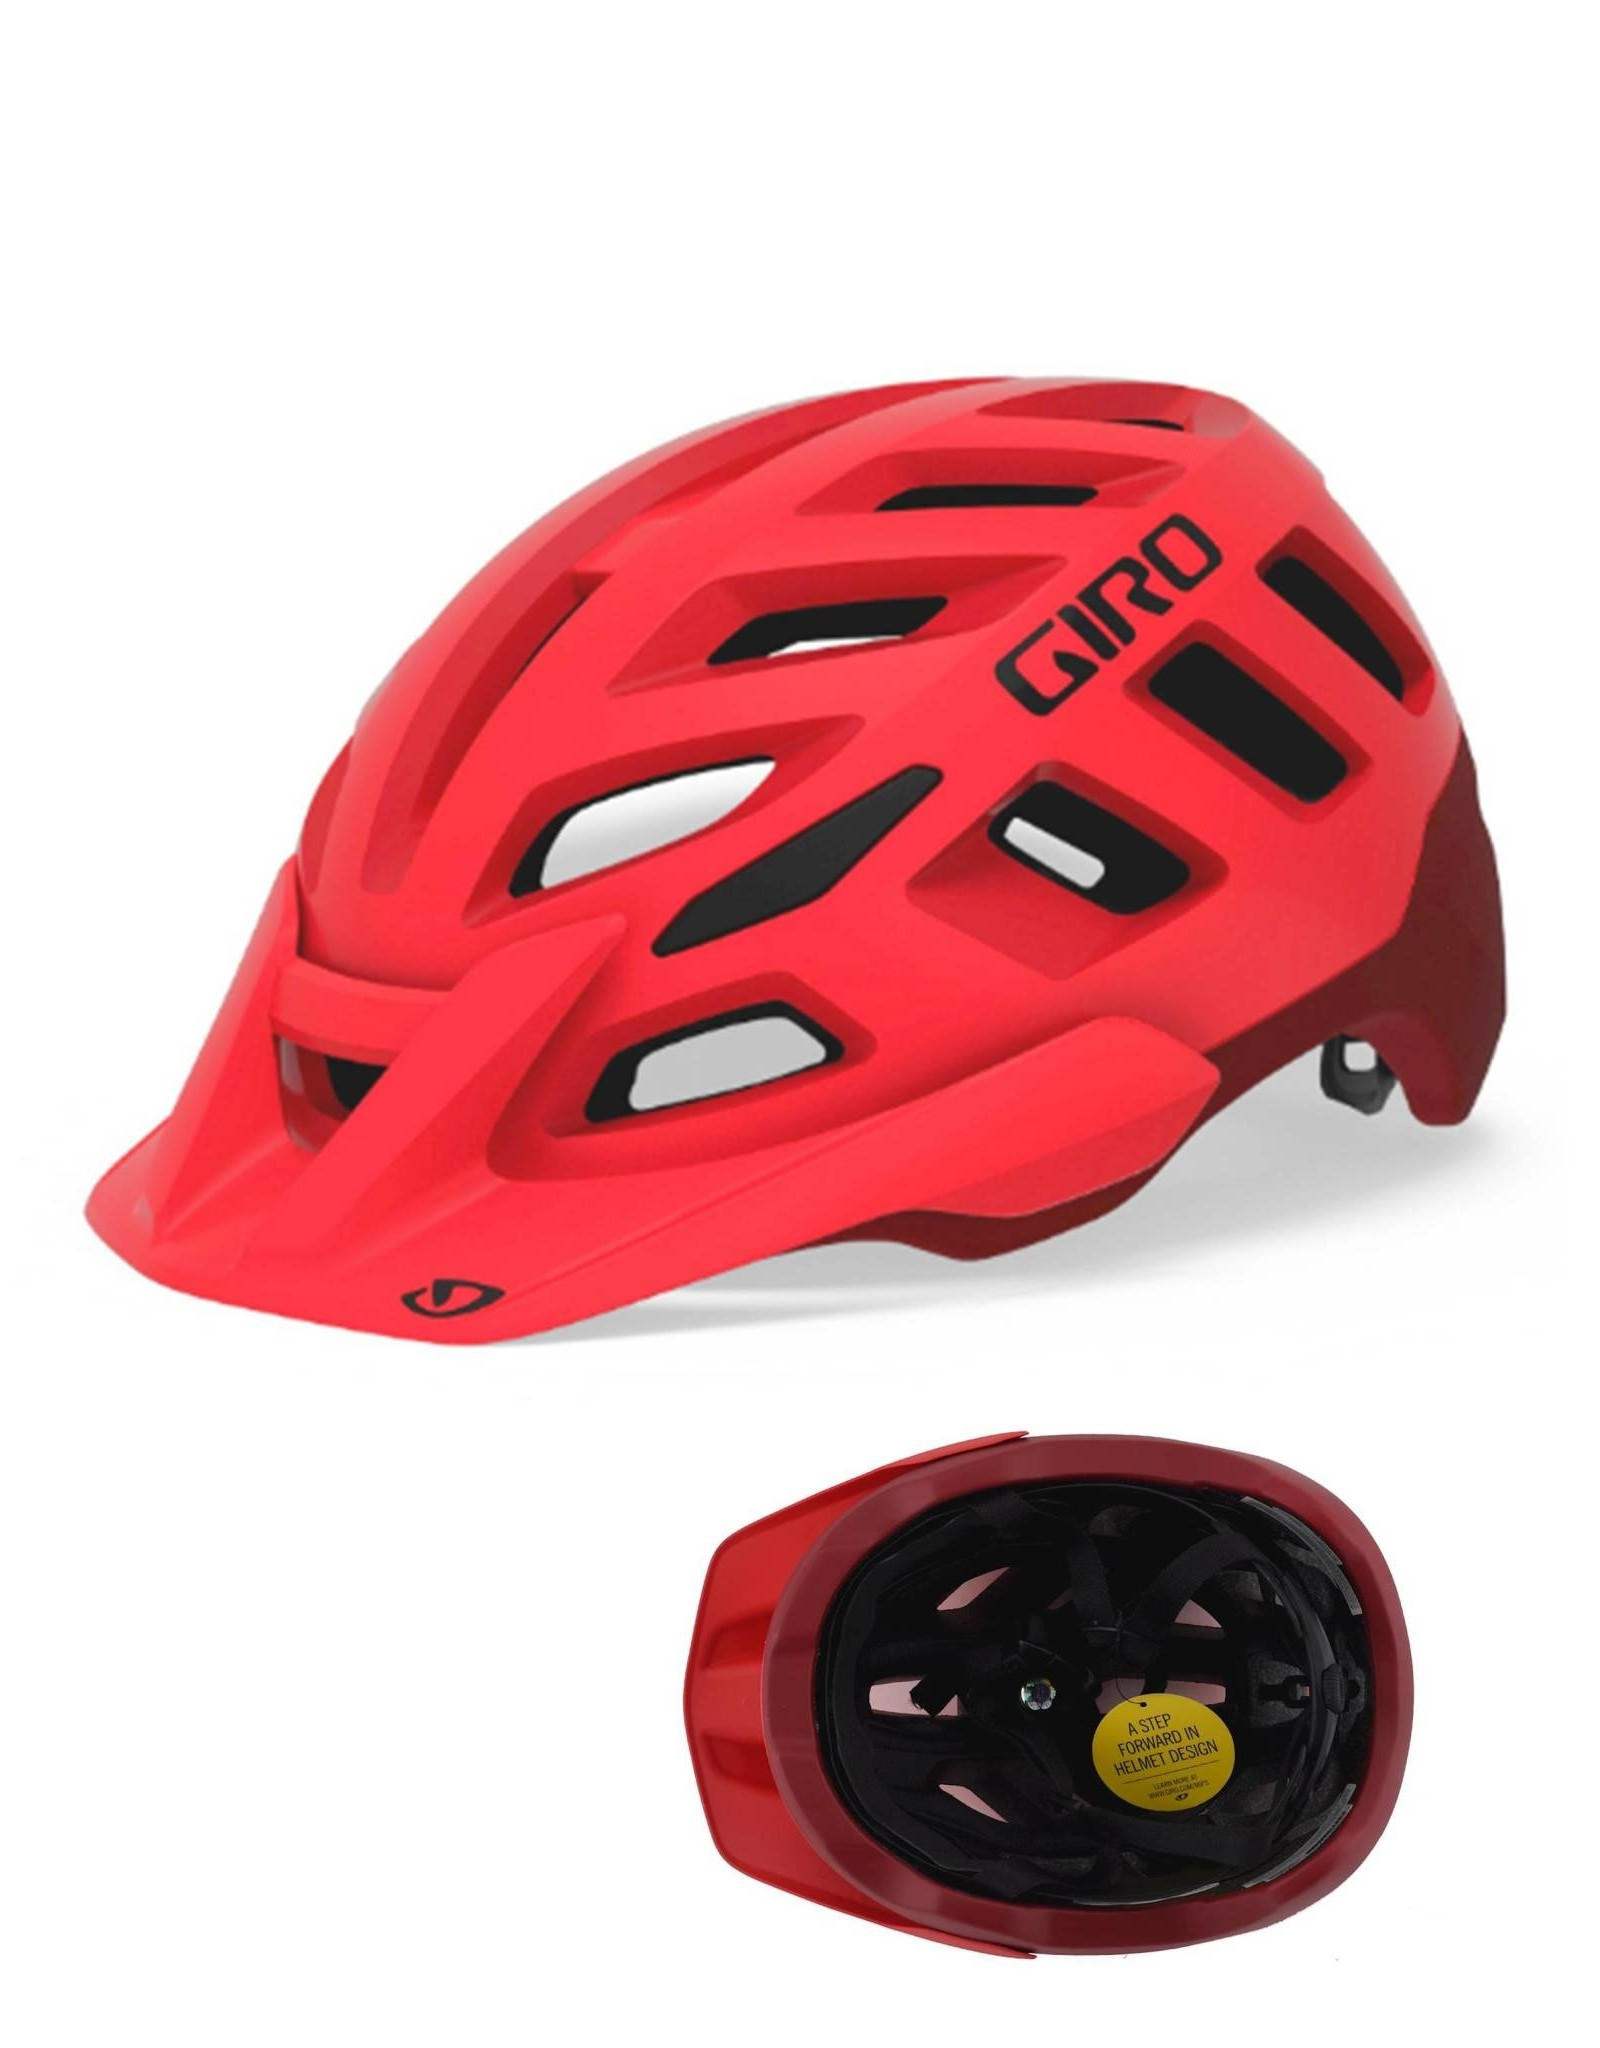 Giro Radix MIPS MTB Helmet Bright Red